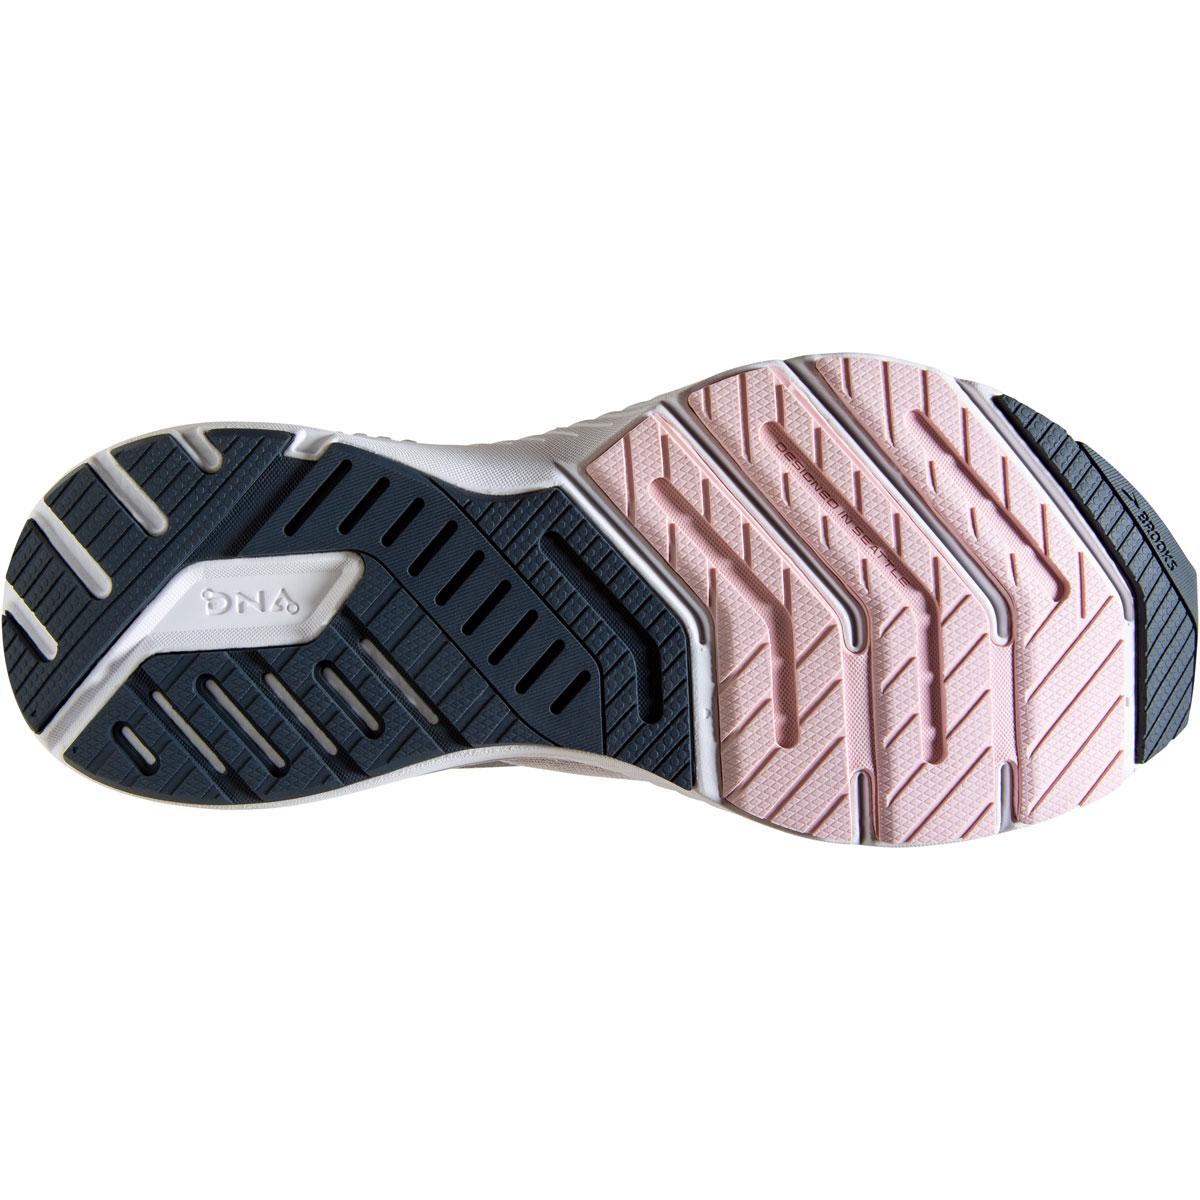 Women's Brooks Launch GTS 8 Running Shoe - Color: Primrose/Ombre - Size: 5 - Width: Regular, Primrose/Ombre, large, image 3